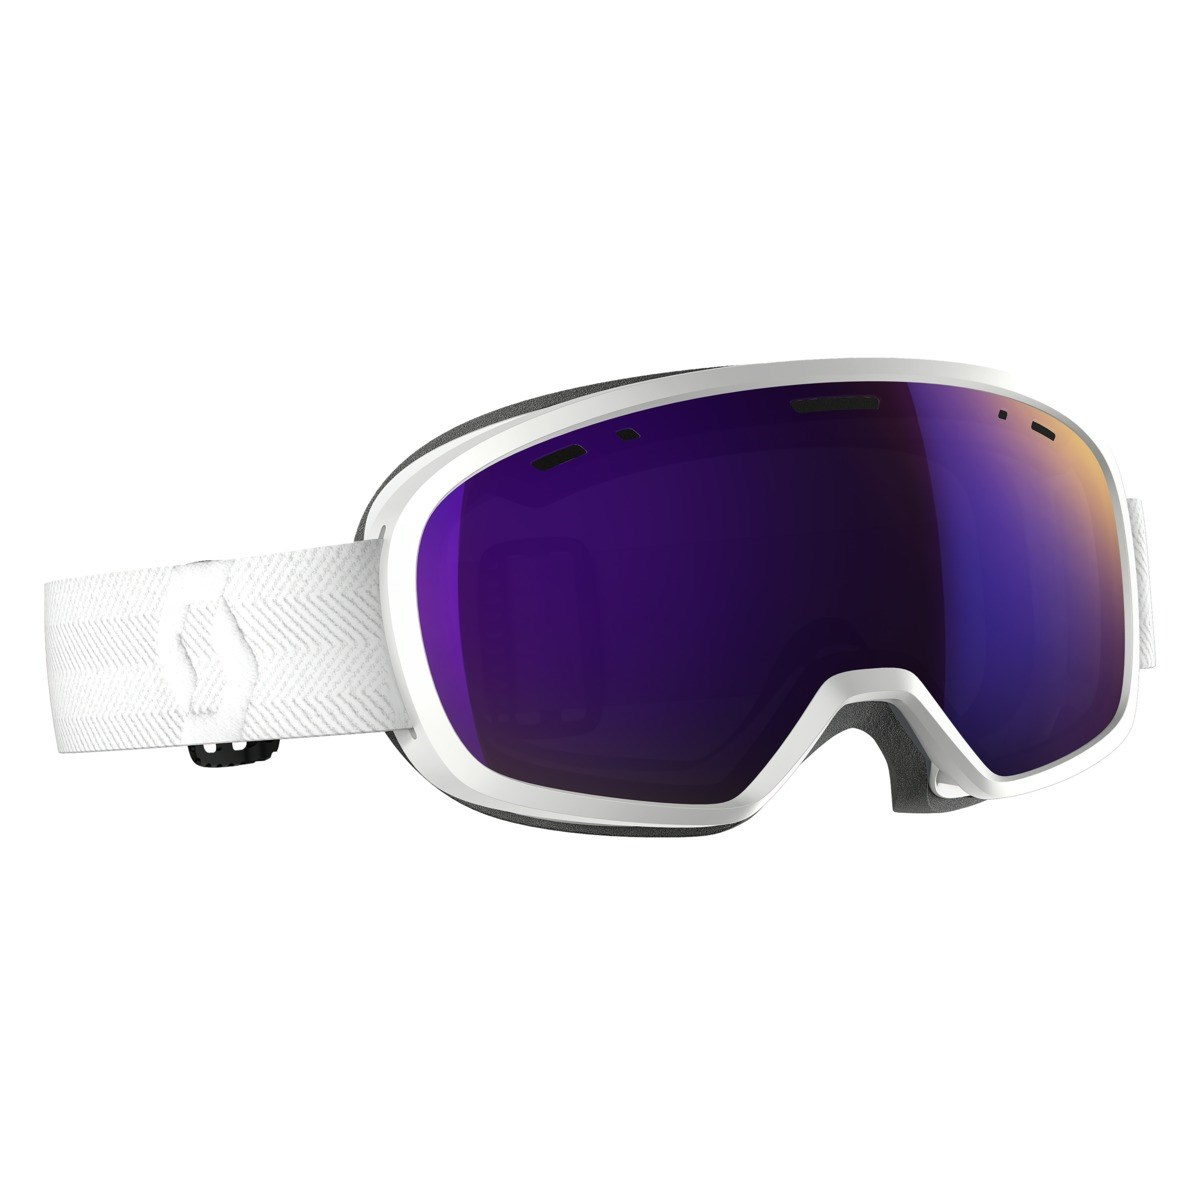 bc77f94fbc Scott Buzz Pro Junior Goggle White   Amplifier Purple Chrome Lens. 0